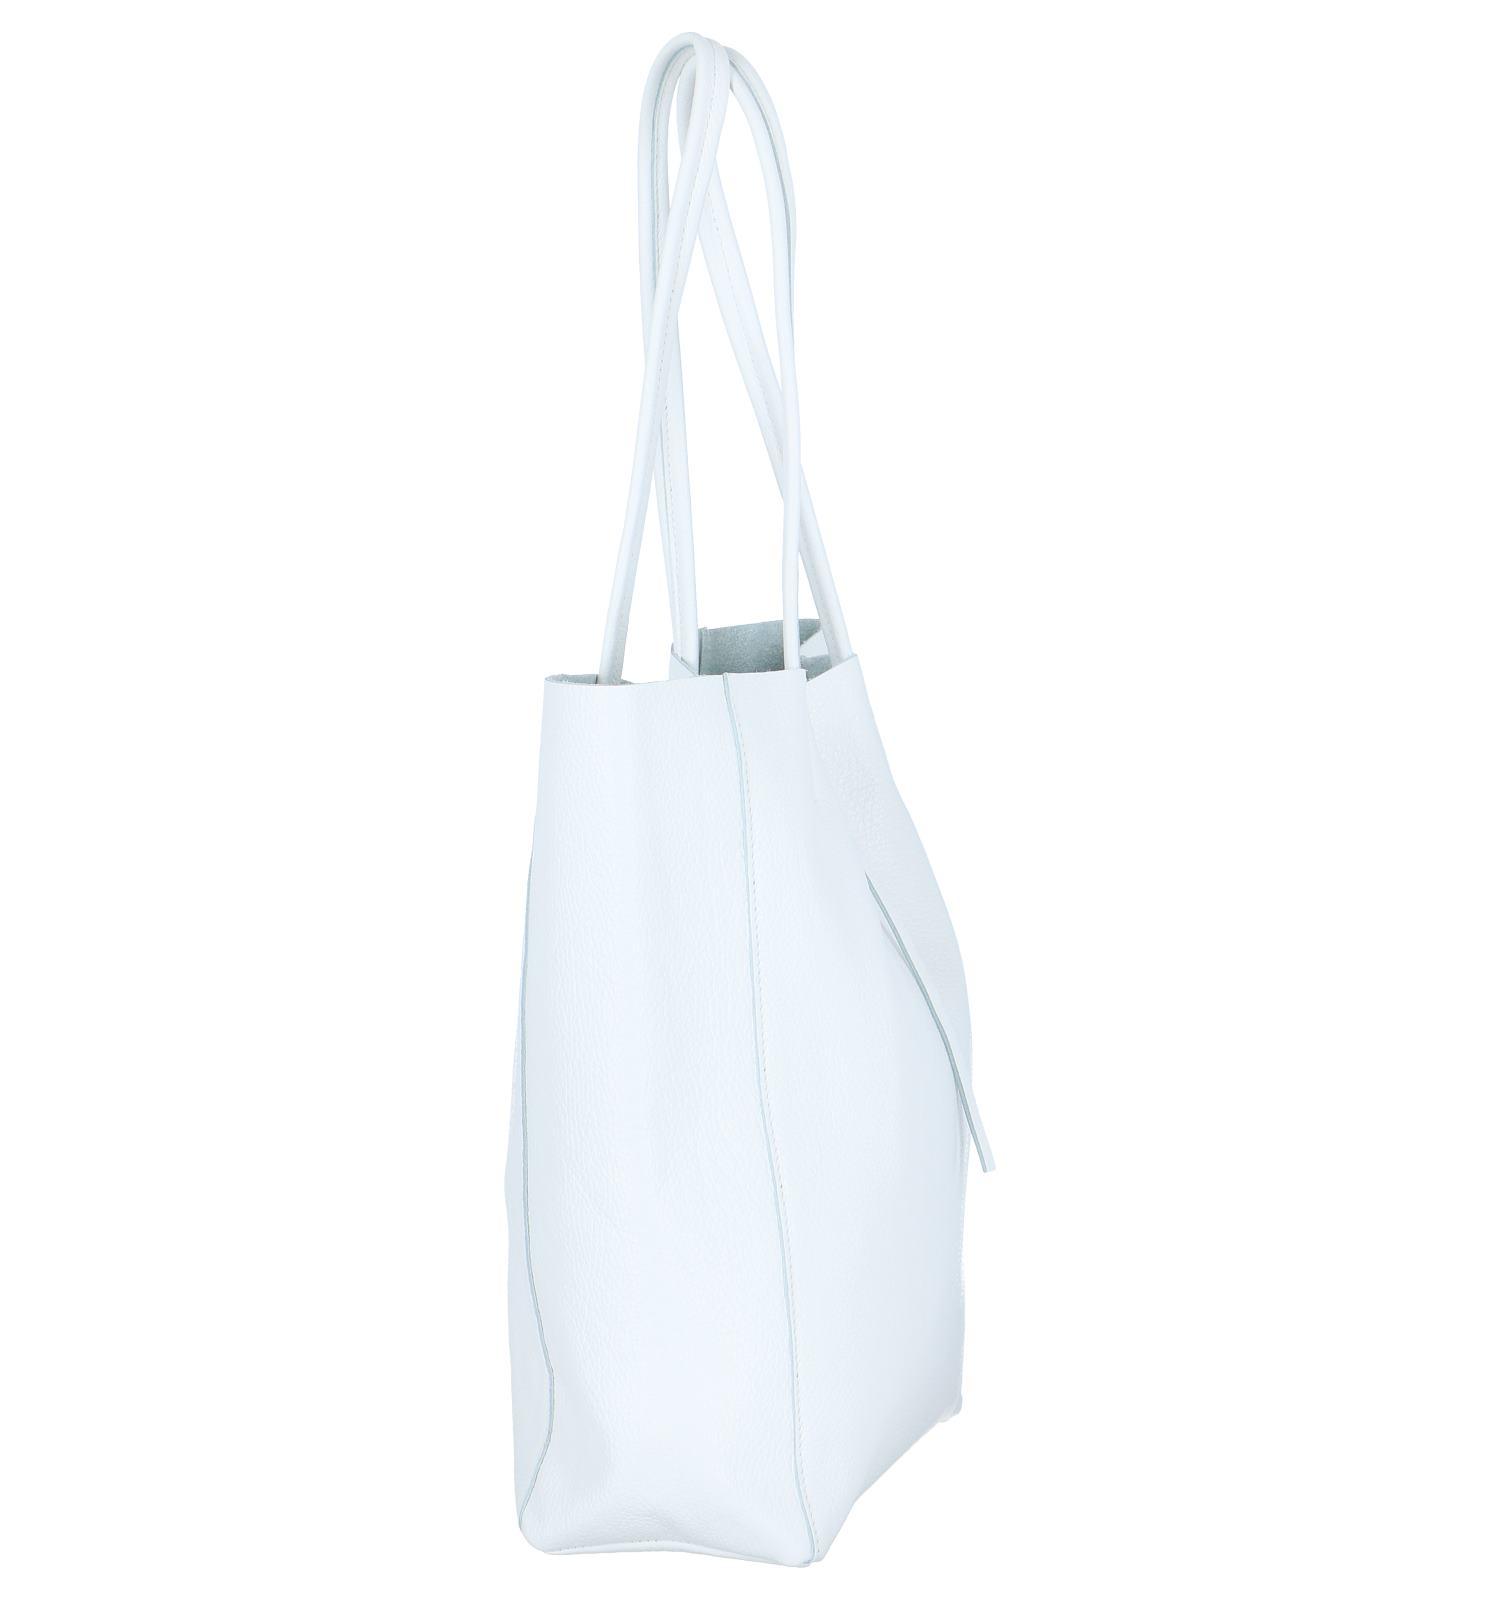 000e144139d Dolce C. Witte Shopper Tas   TORFS.BE   Gratis verzend en retour